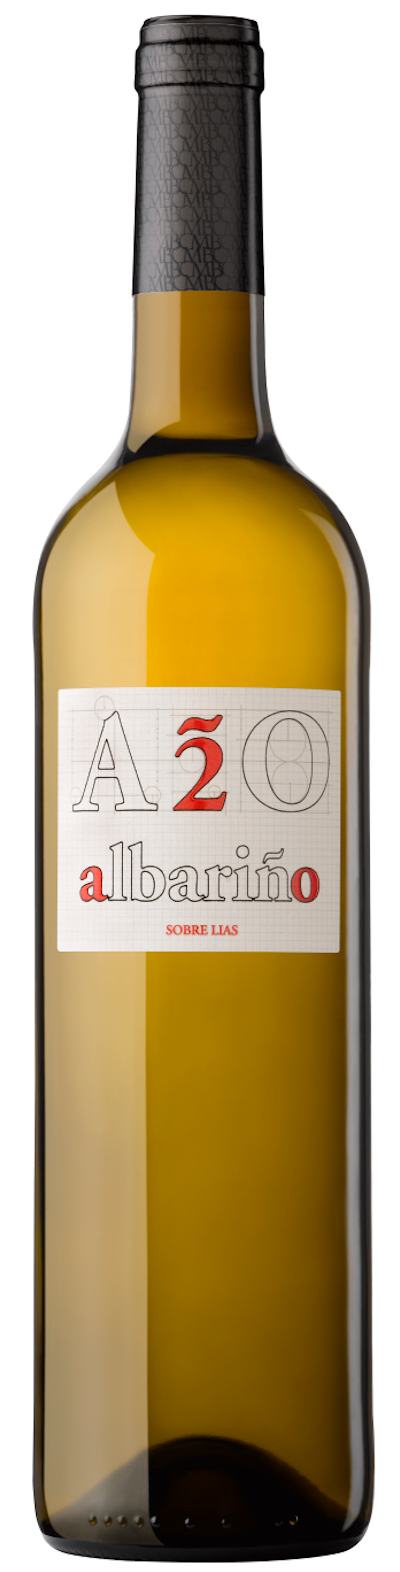 Castro Martin - Albariño A2O